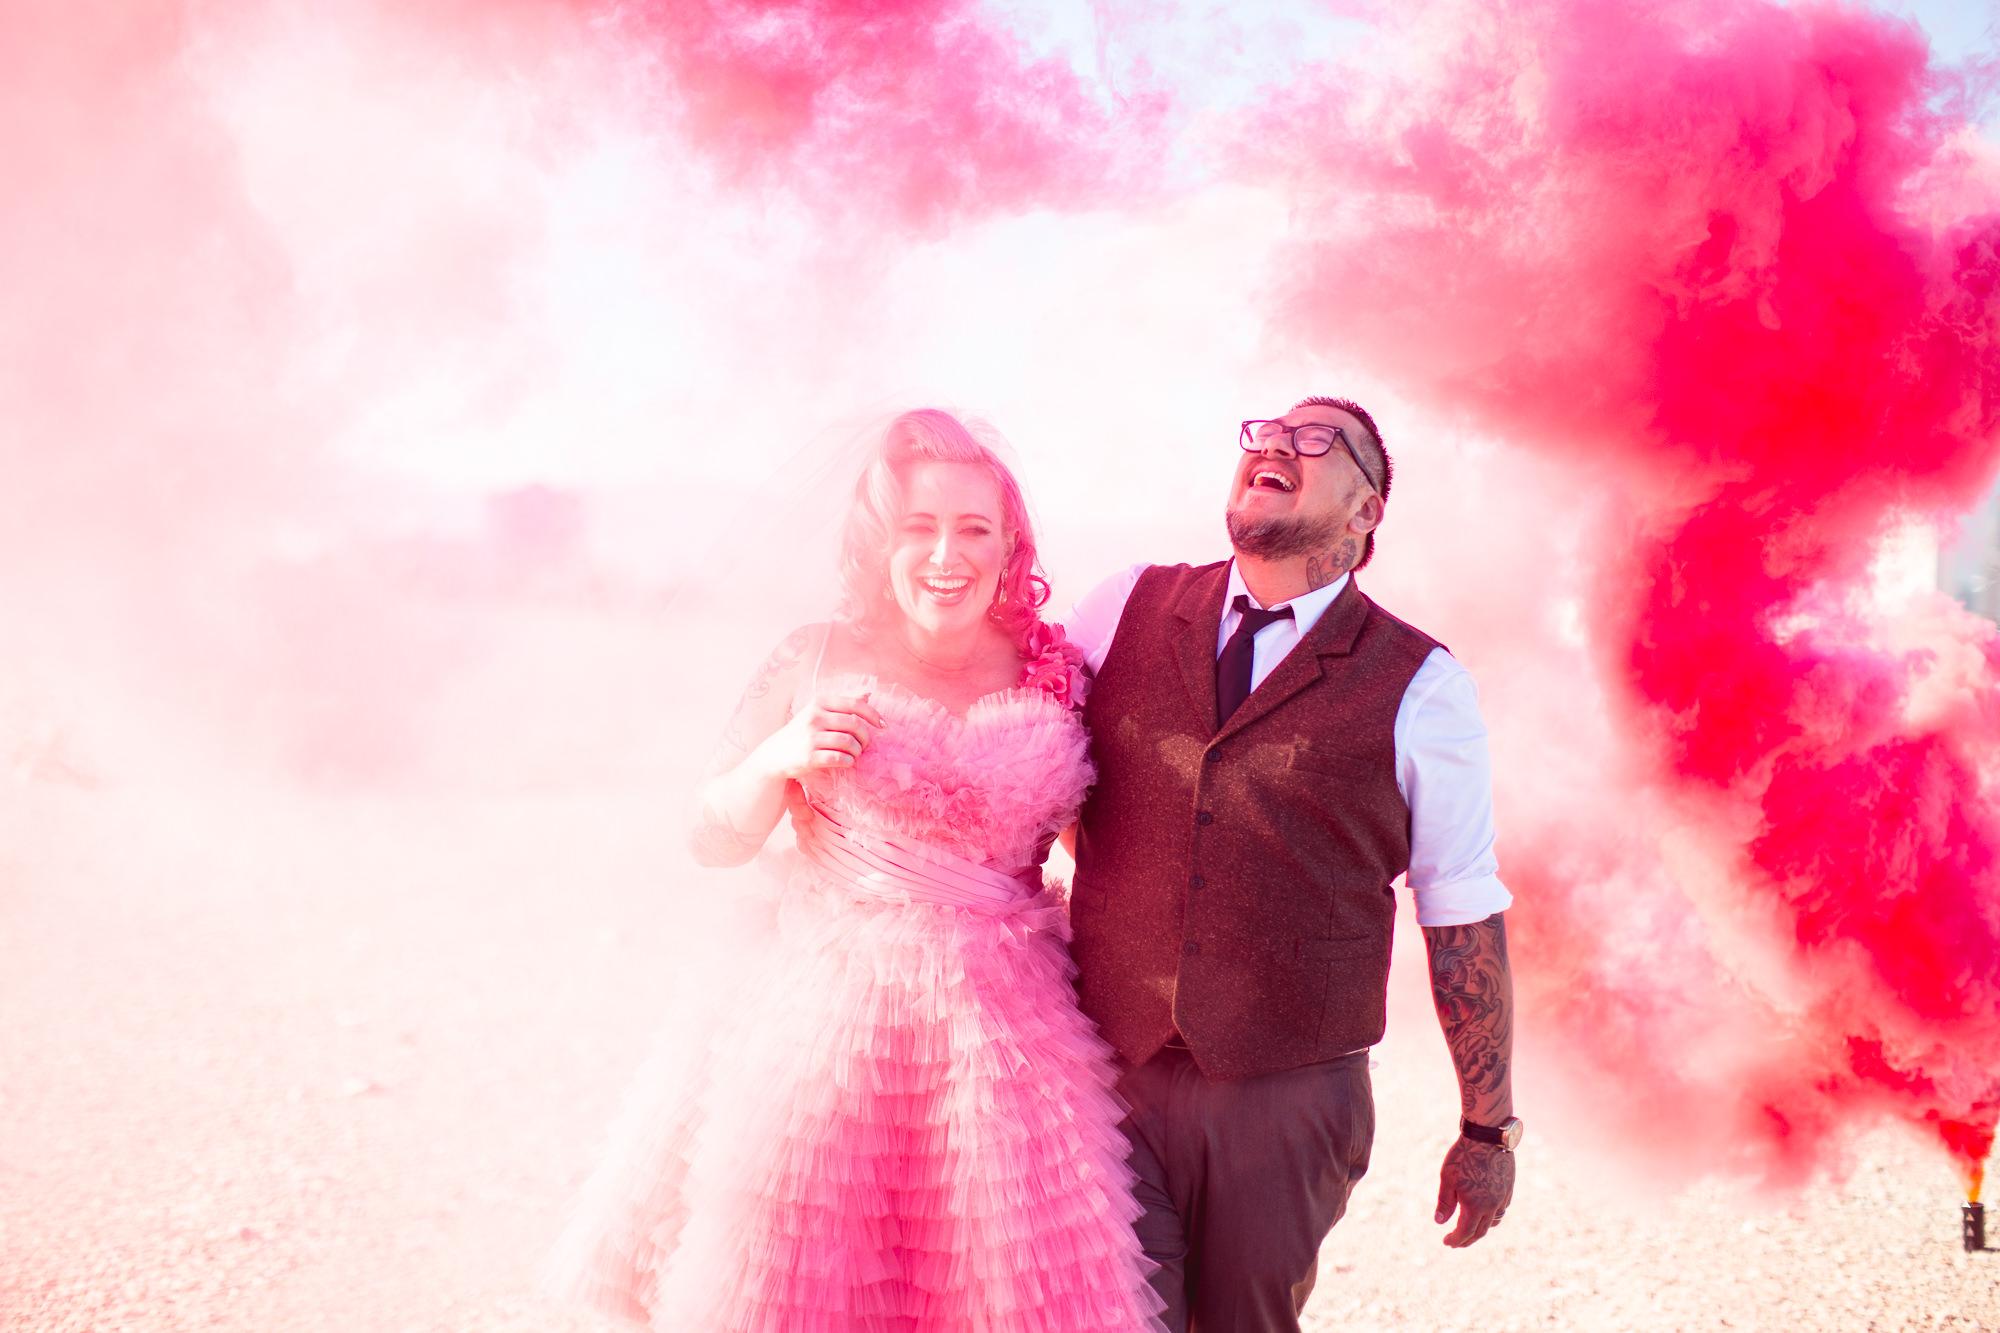 pink smoke and pink bride